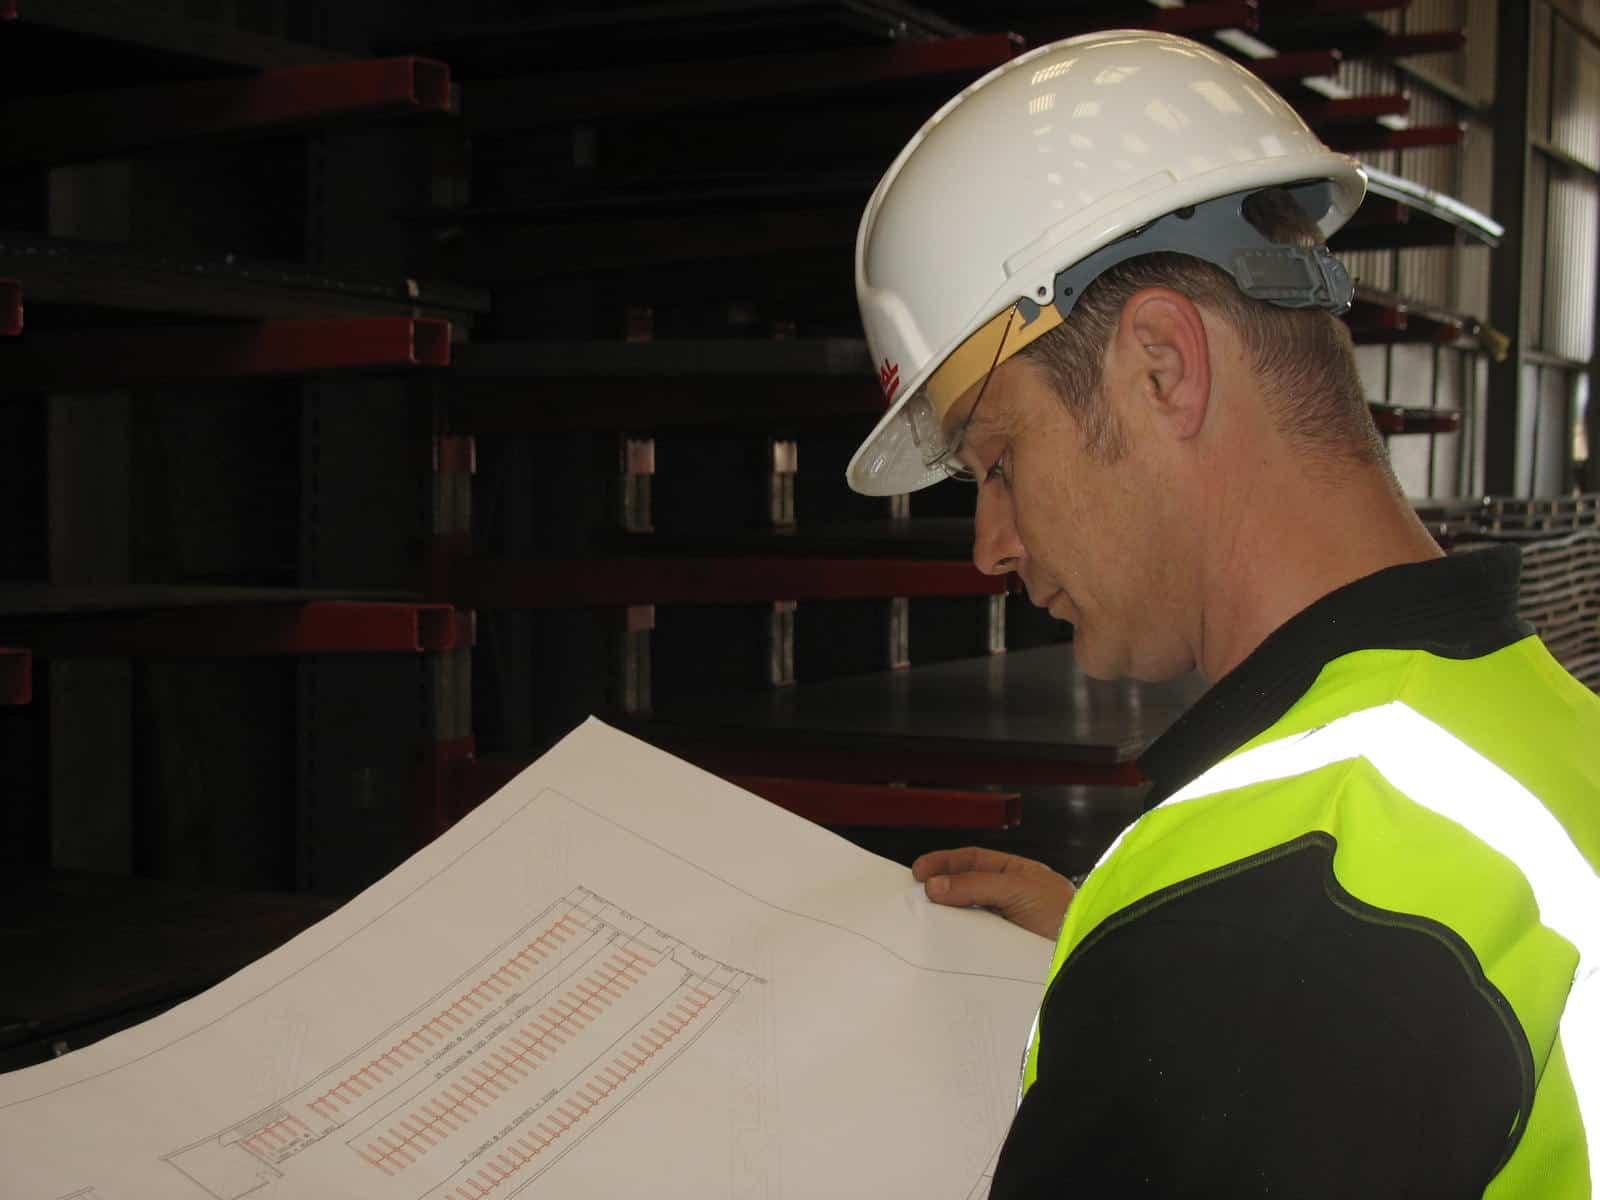 S.E.M.CO Warehouse Racking Inspector